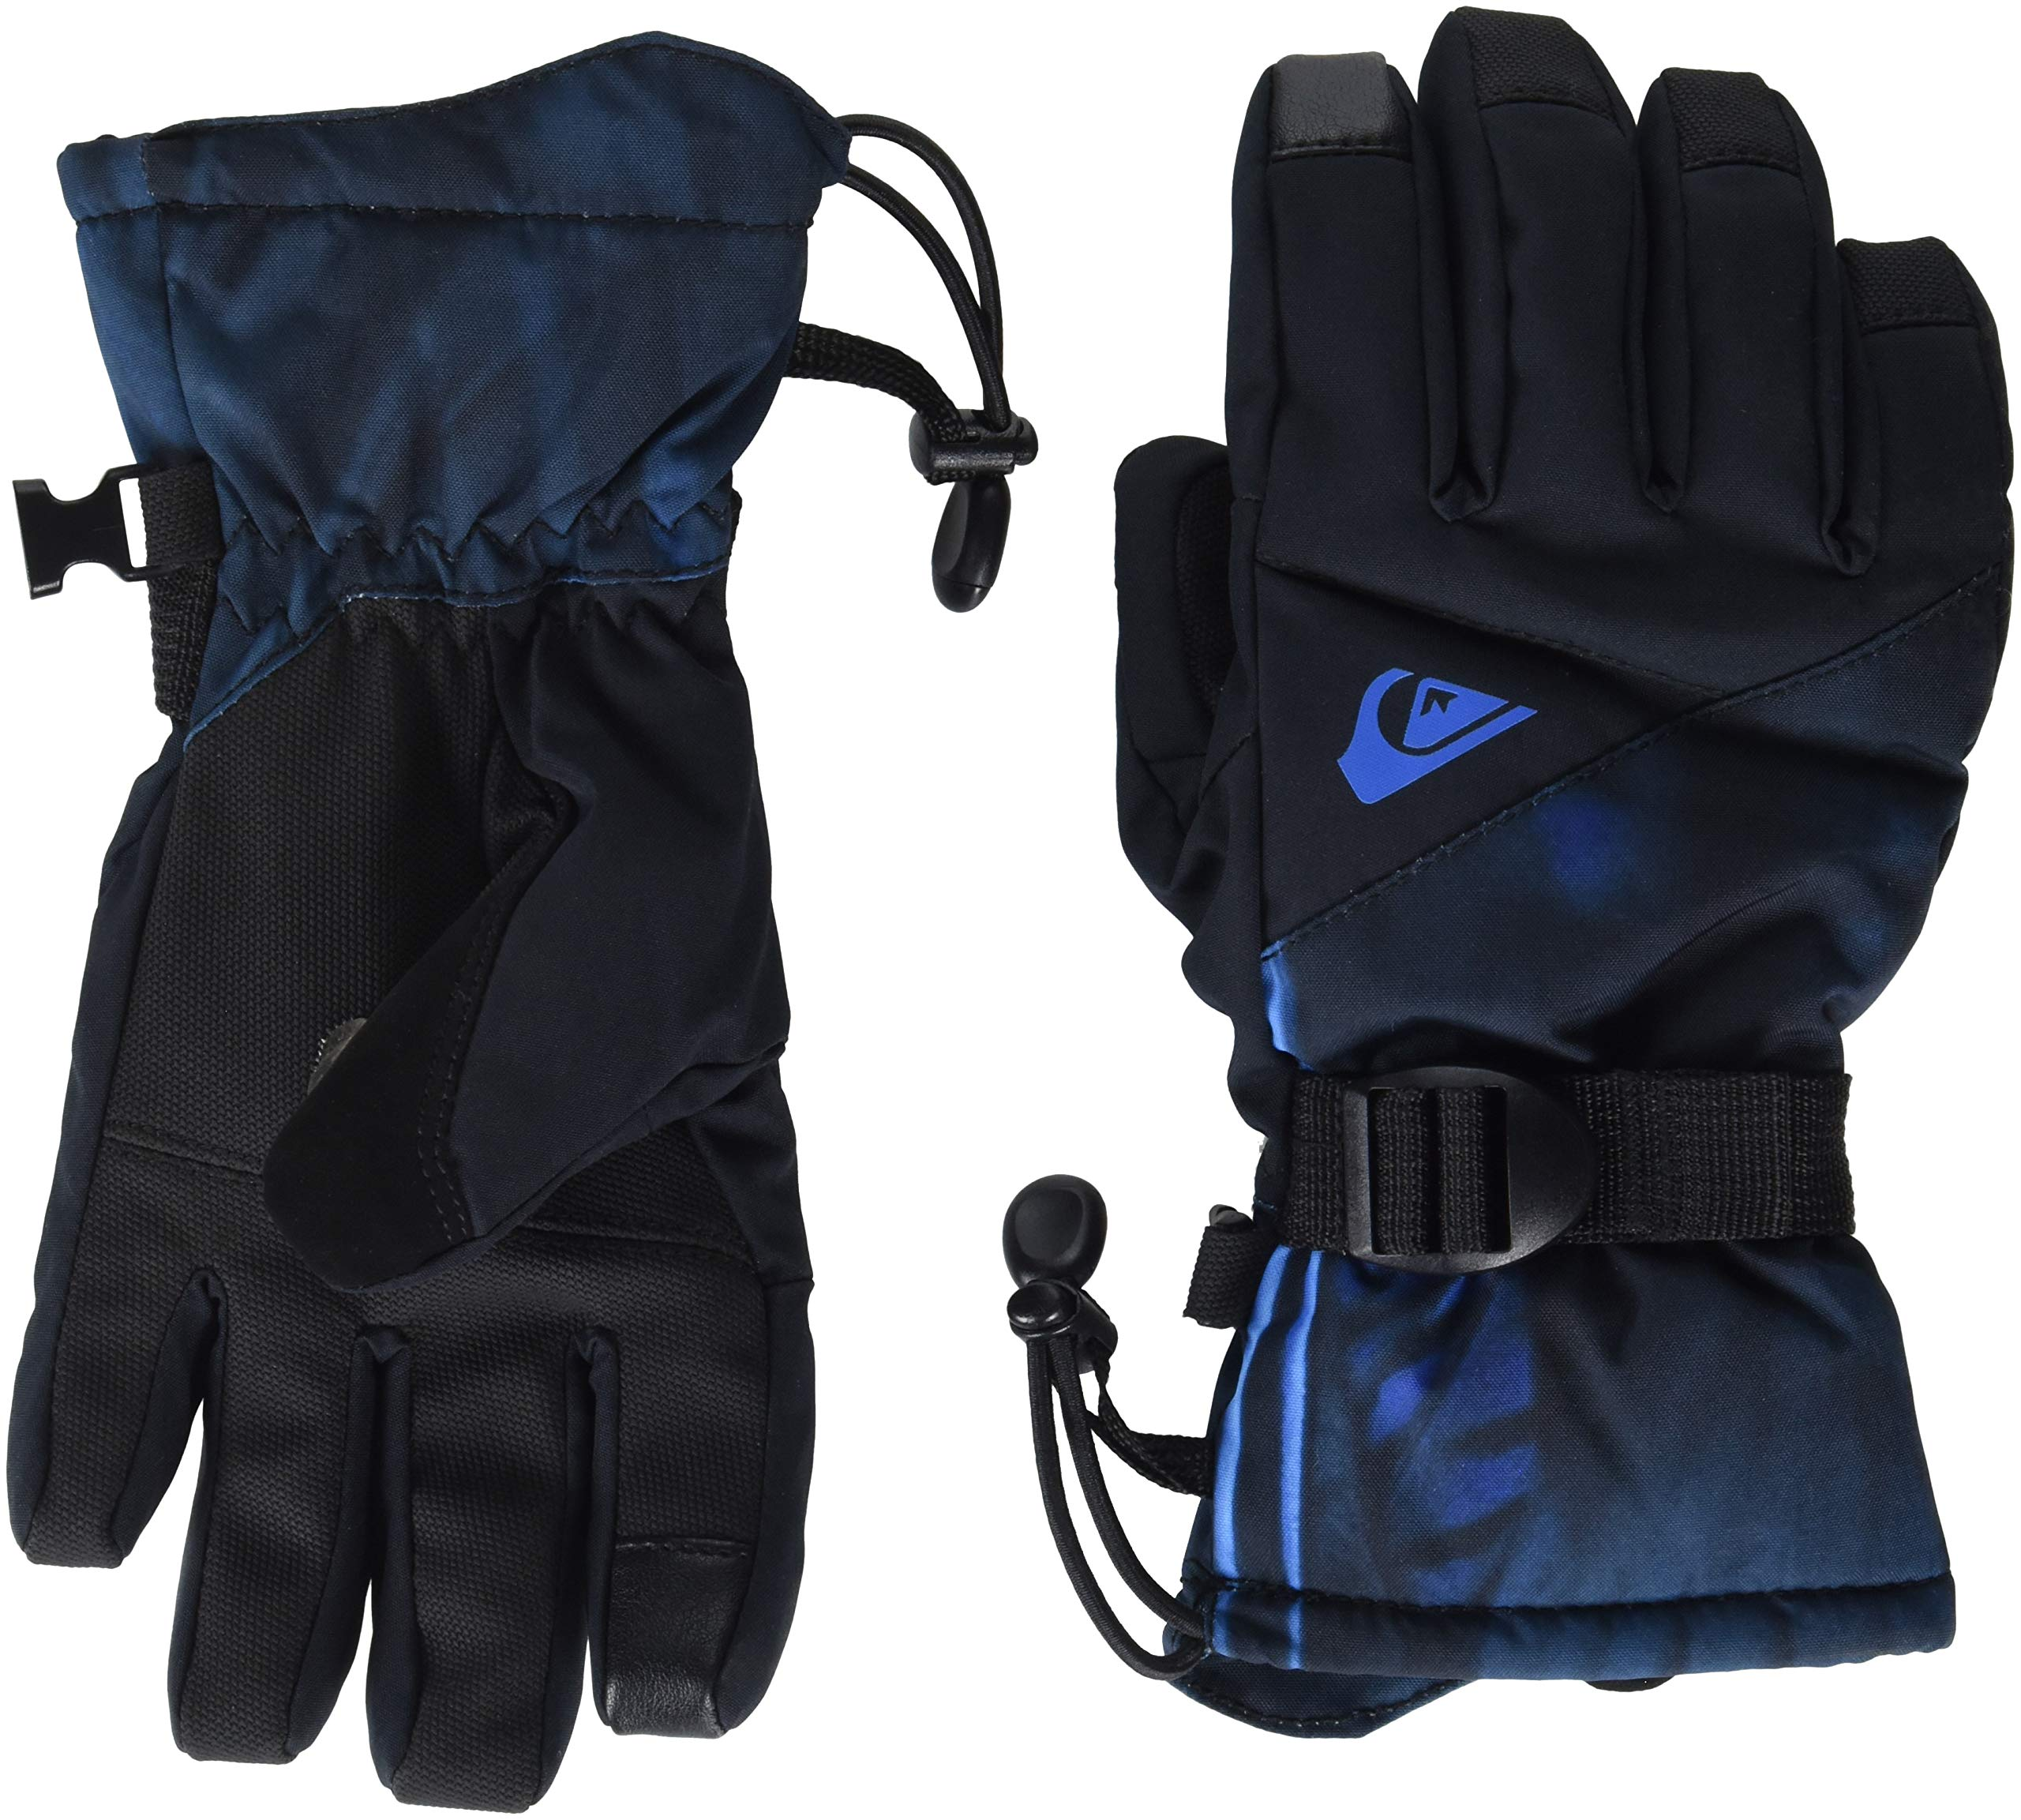 Quiksilver Boys' Big Mission Youth Glove TECH Snow GOLVE, Daphne Blue Stellar, L